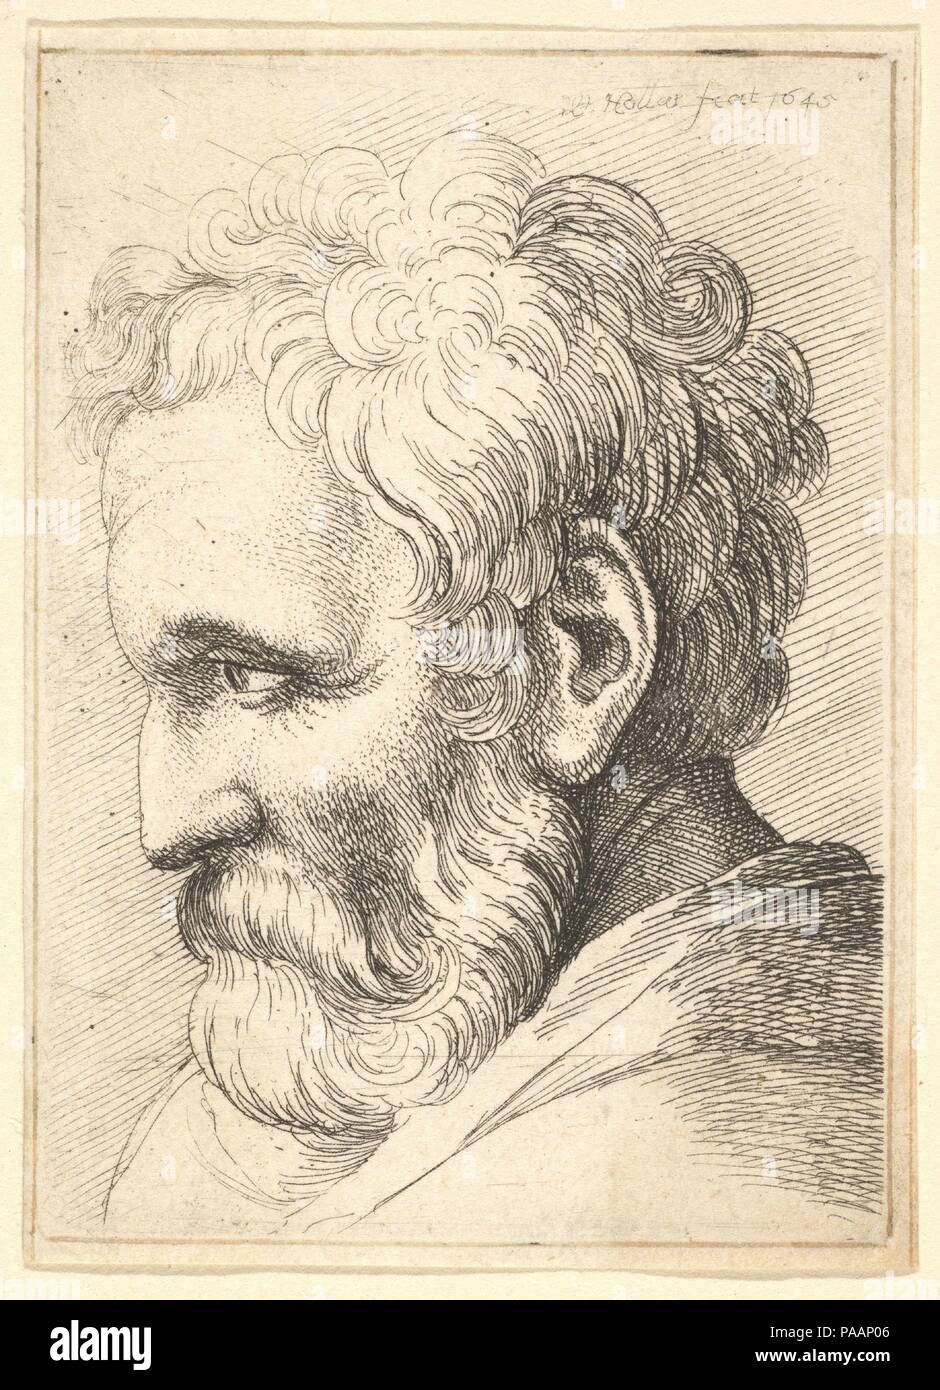 Bearded Old Man Artist Wenceslaus Hollar Bohemian Prague 1607 1677 London Dimensions Plate 2 3 4 2 In 7 5 1 Cm Sheet 2 13 16 2 1 16 In 7 2 5 2 Cm